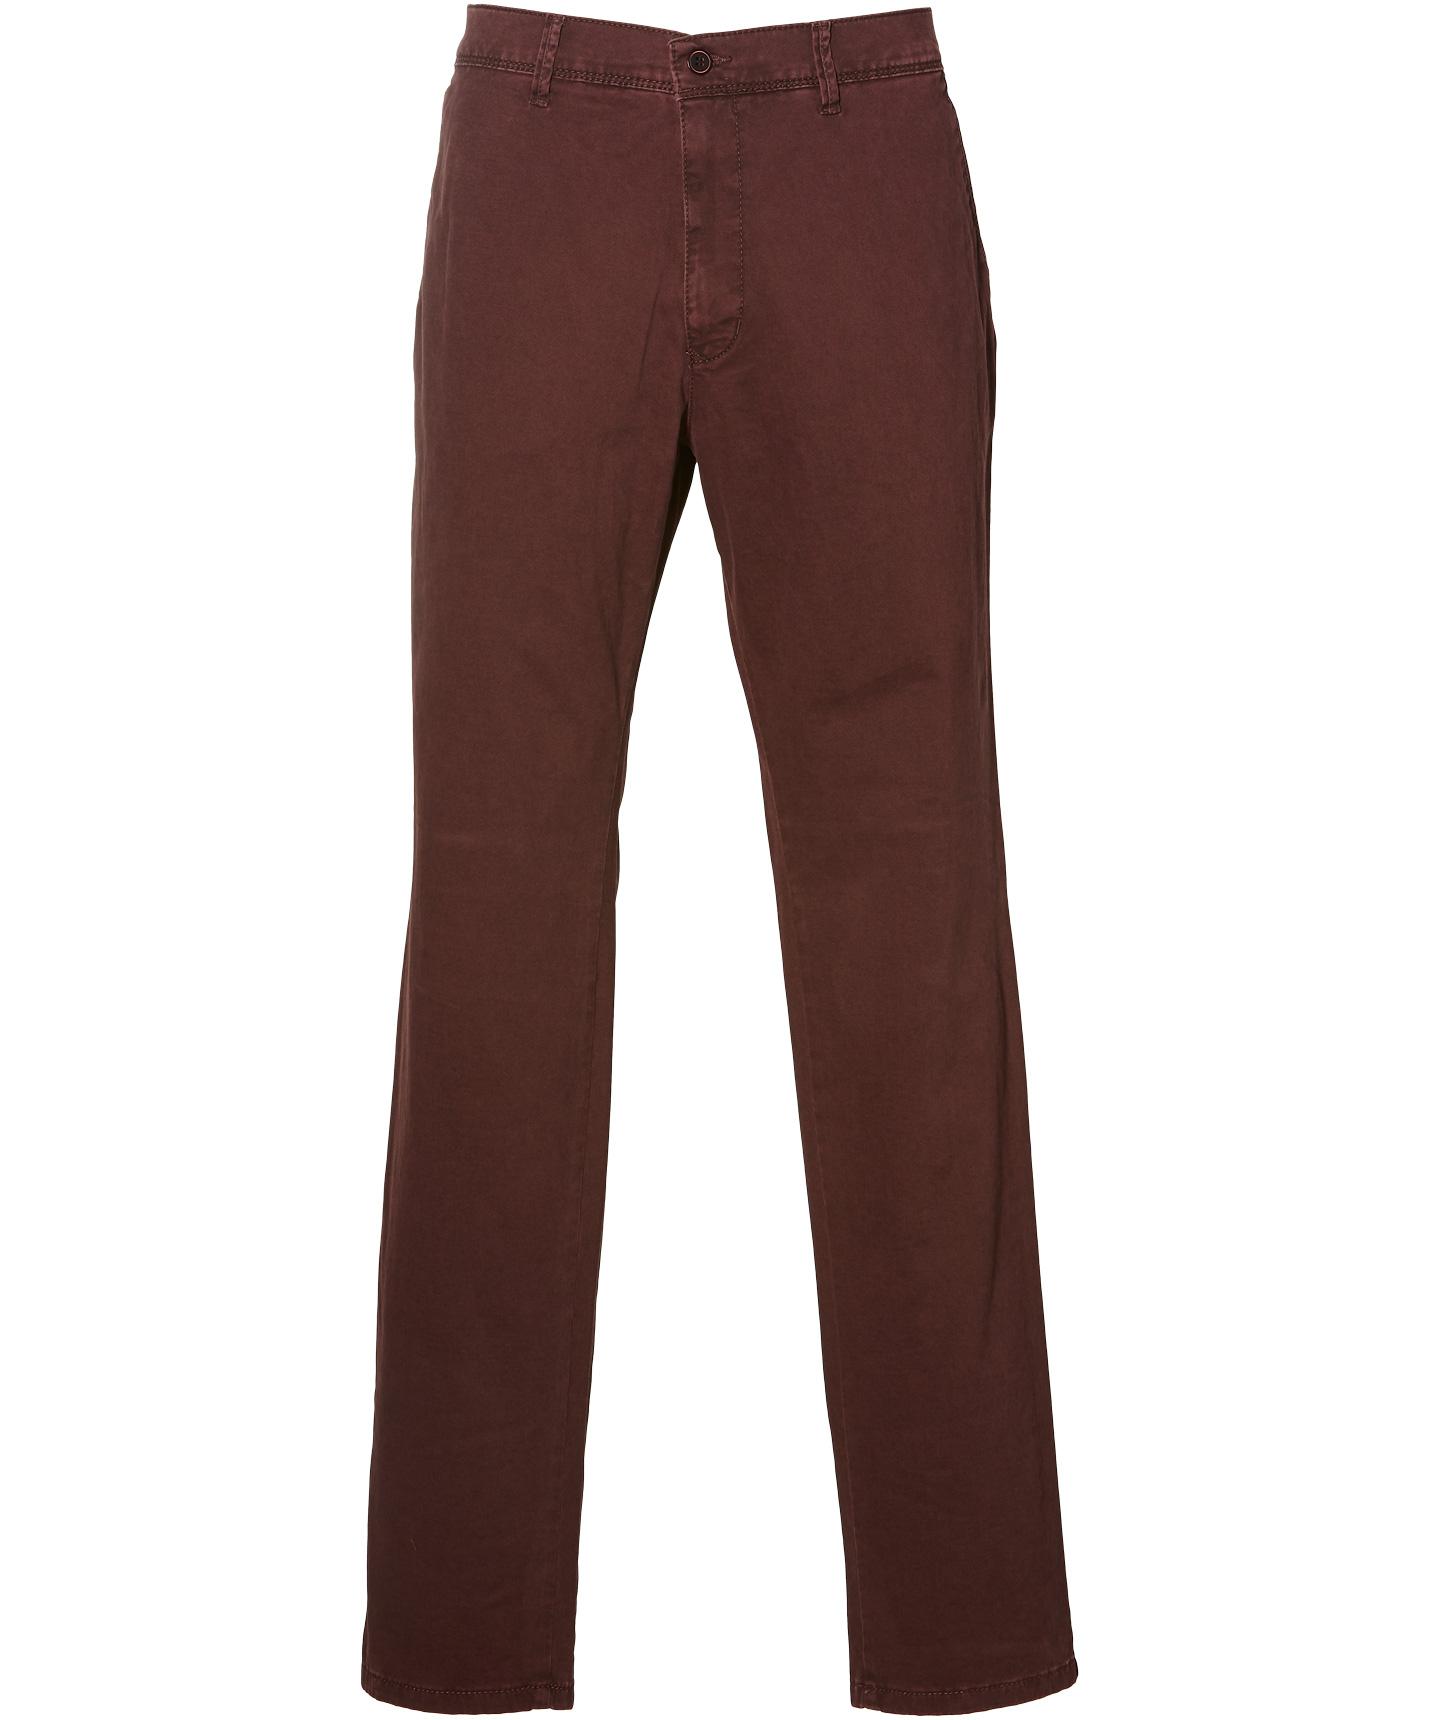 Sale - Pionier Pantalon Robert - Regular Fit - Rood